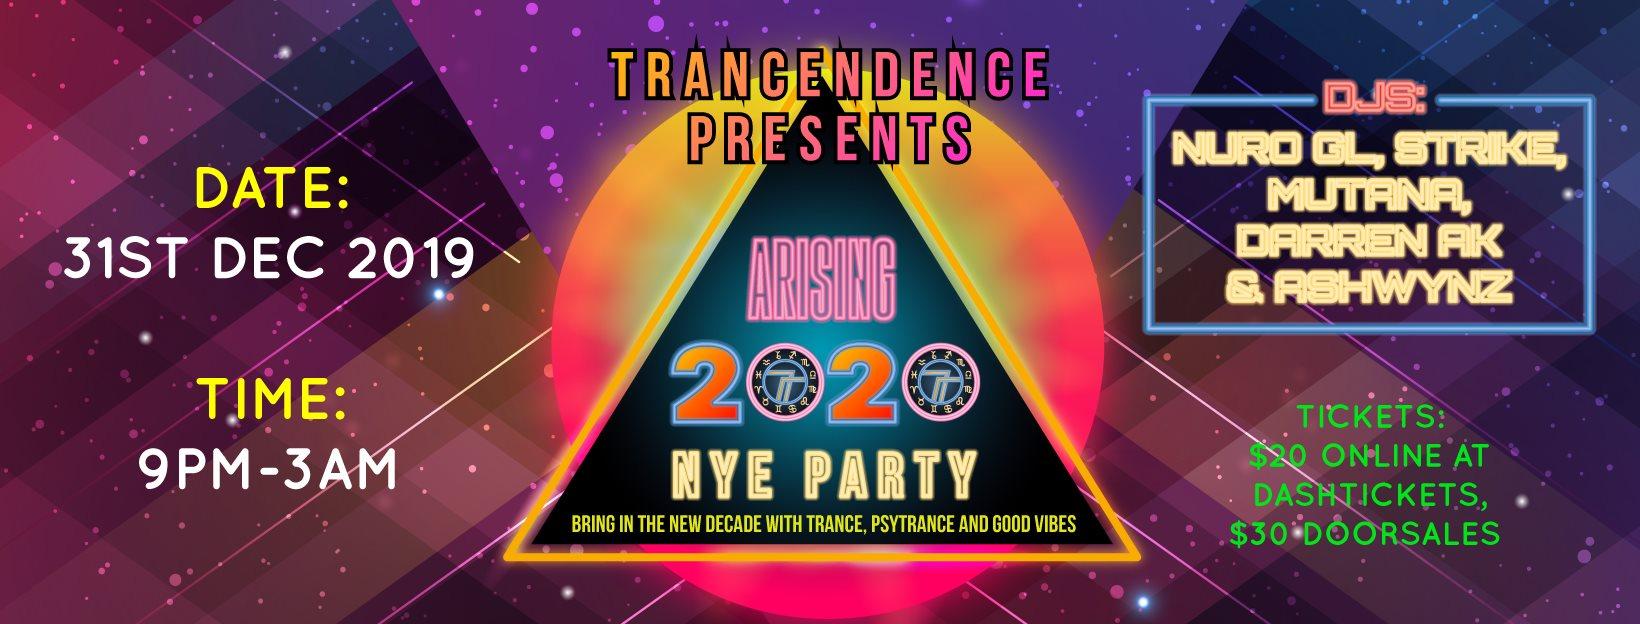 Transcendence Arising 2020